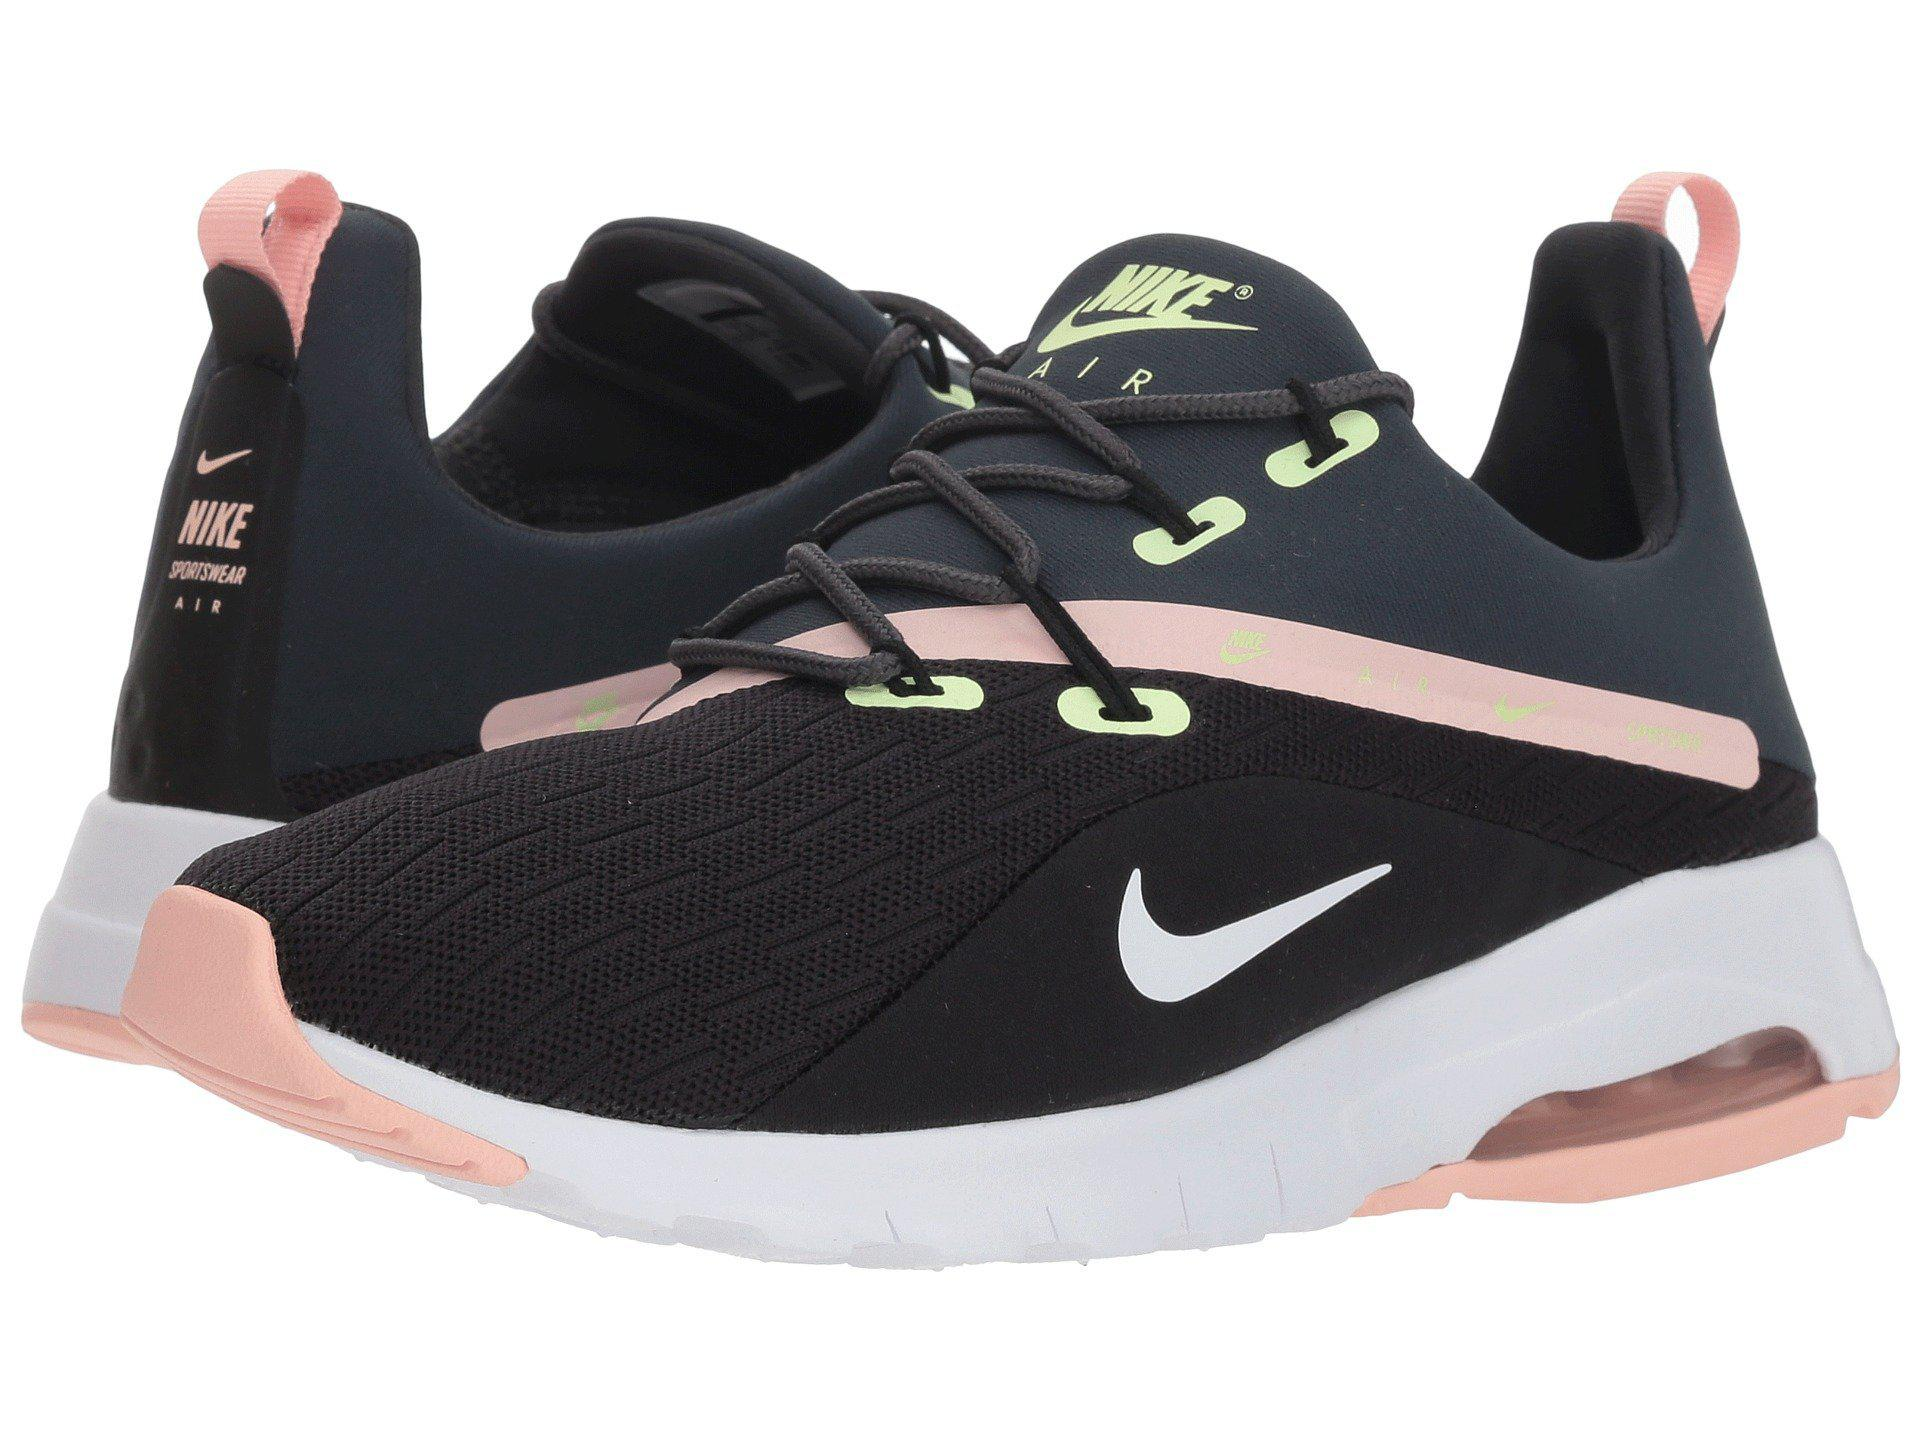 reputable site 6b5e8 2b002 Nike. Women s Black Air Max Motion Racer 2